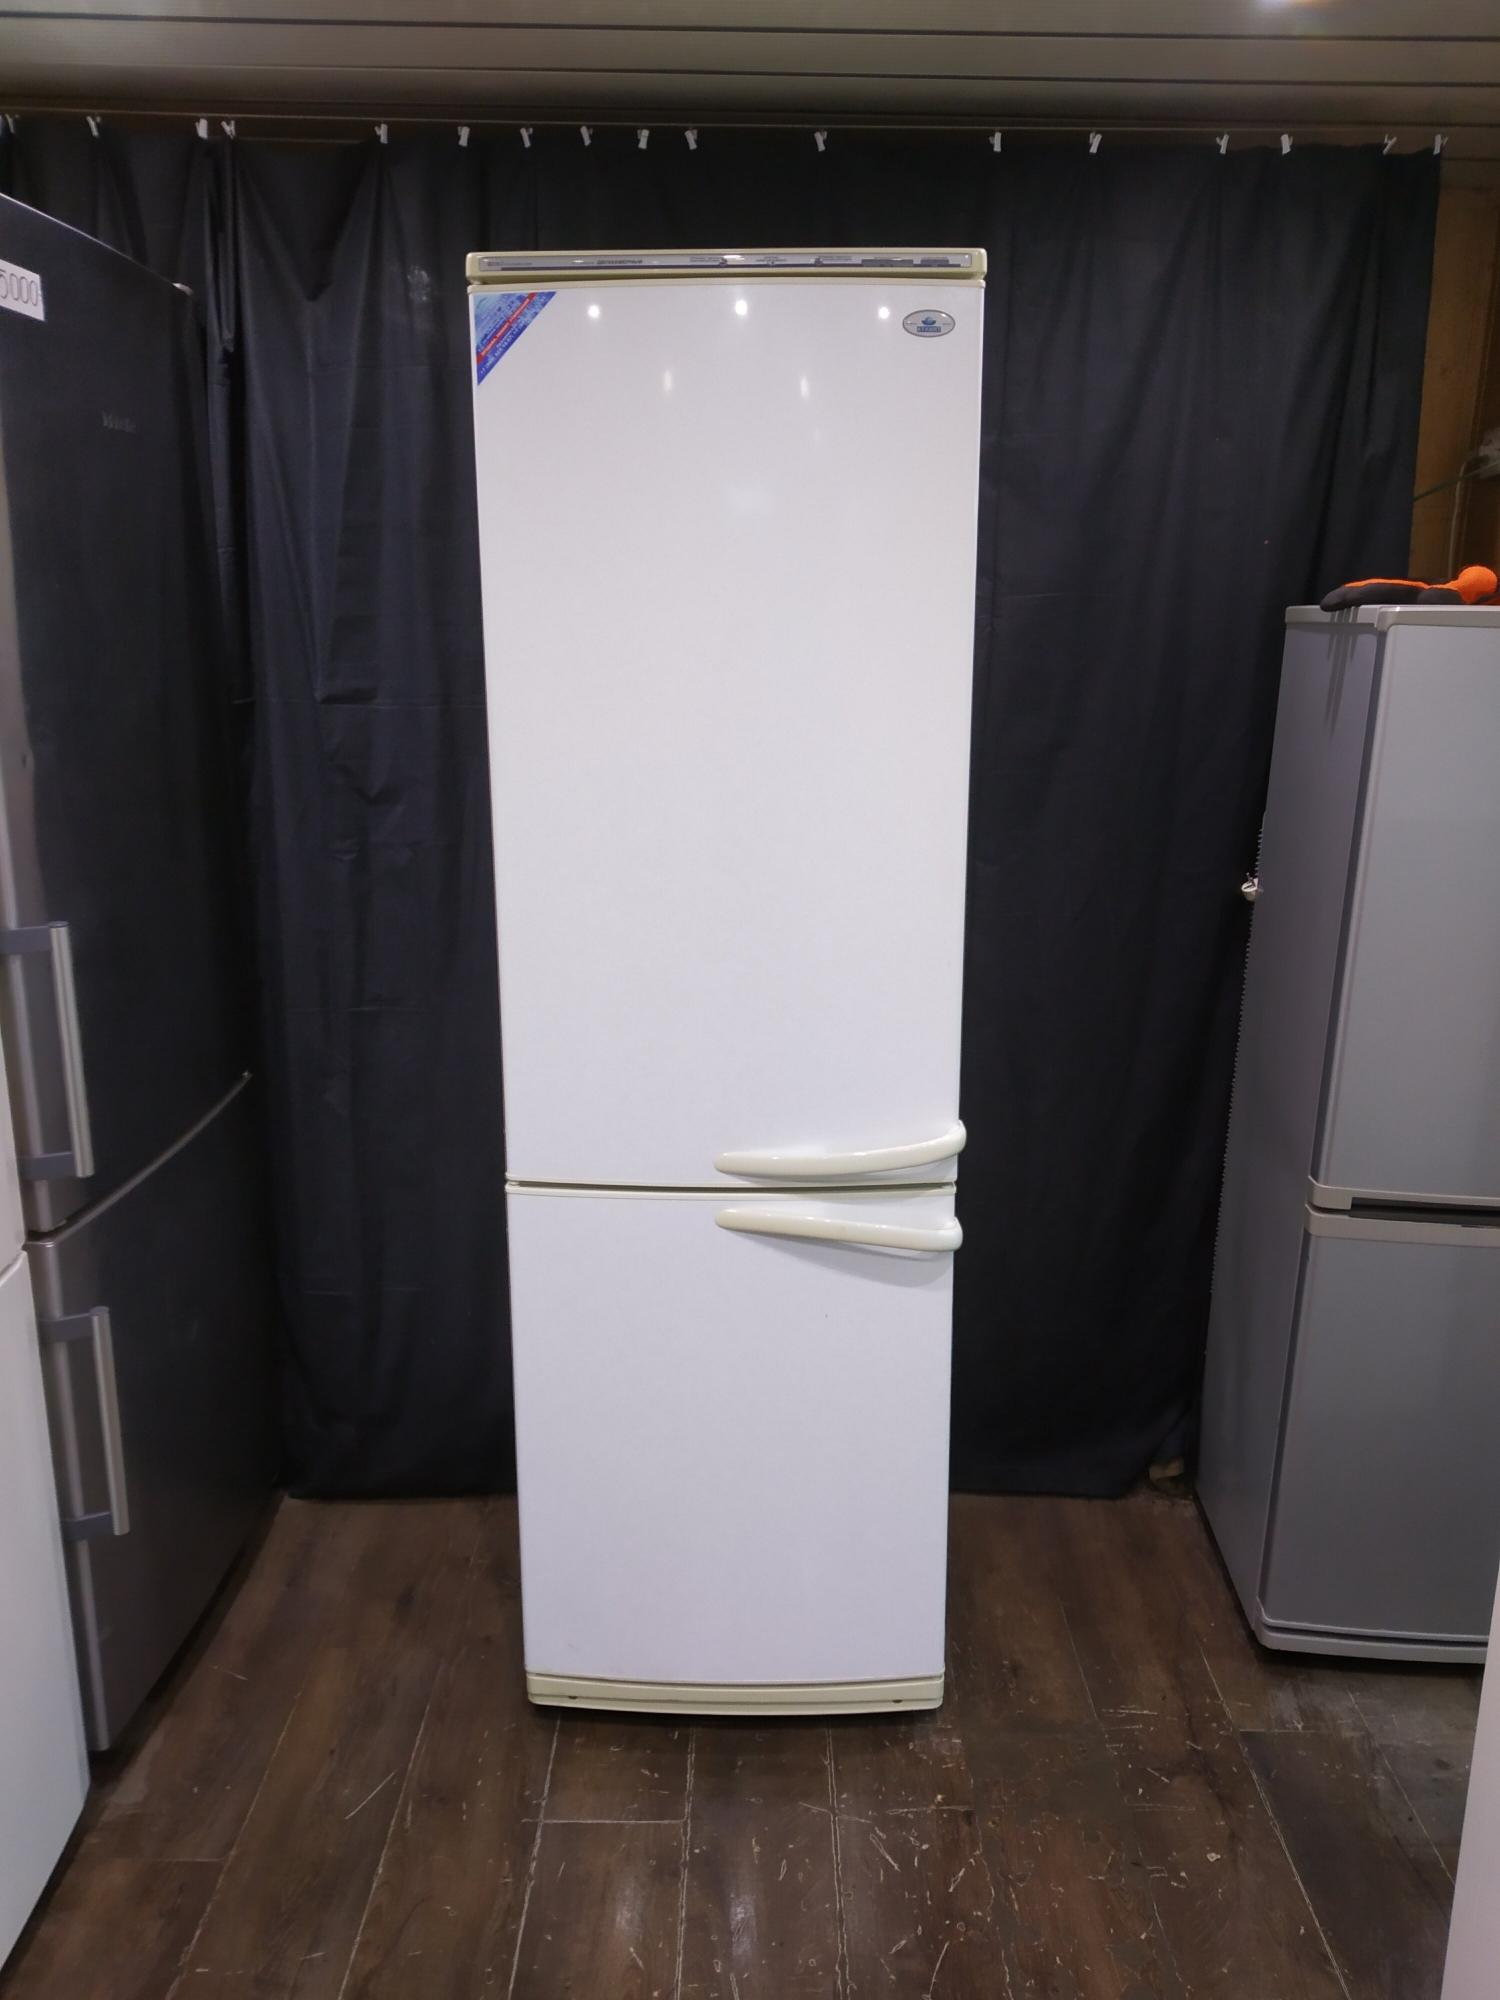 Refrigerator Atlant in Moscow 89998926361 buy 1